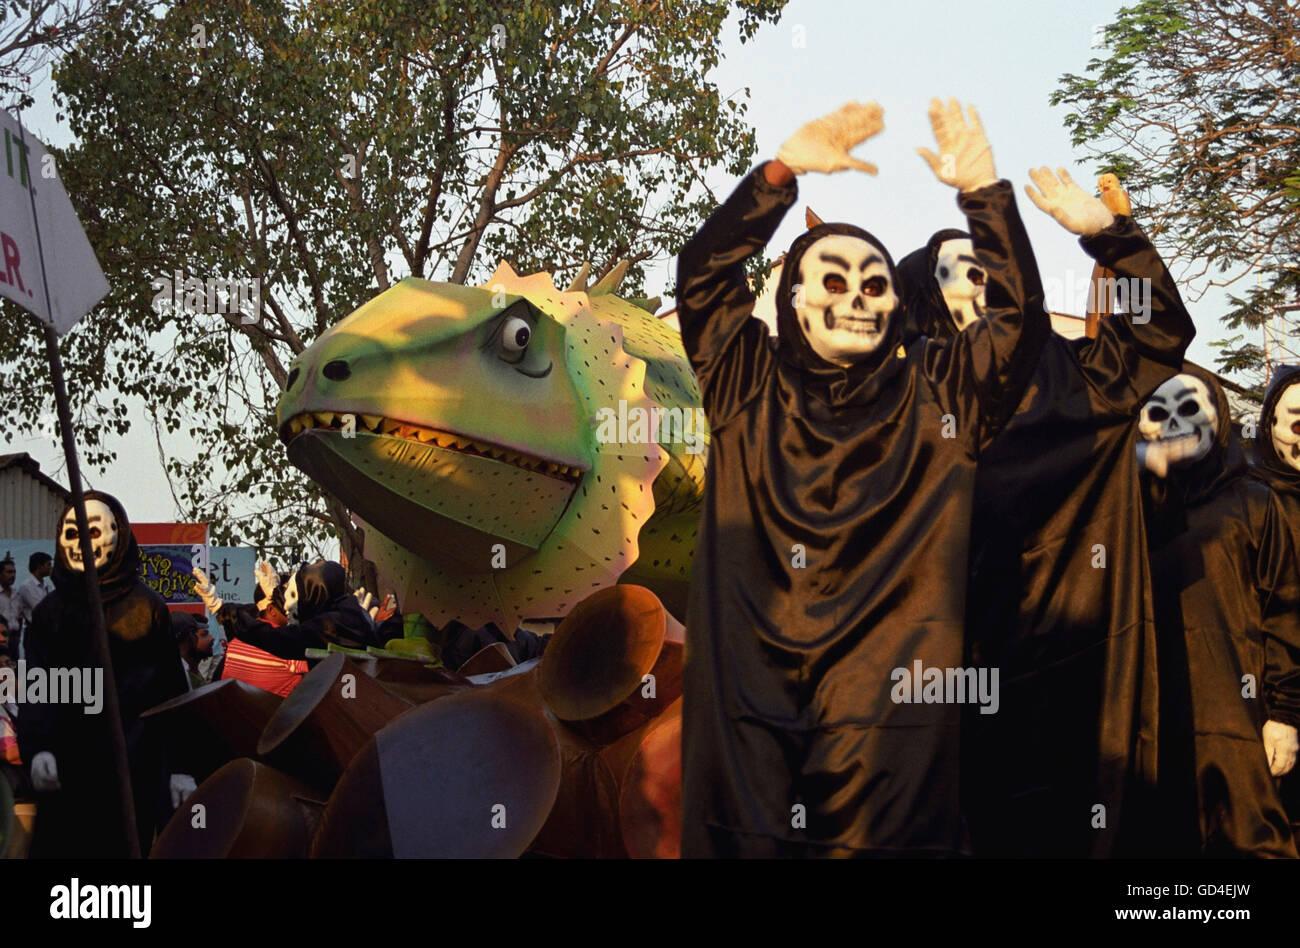 Artistes performing at the carnival - Stock Image